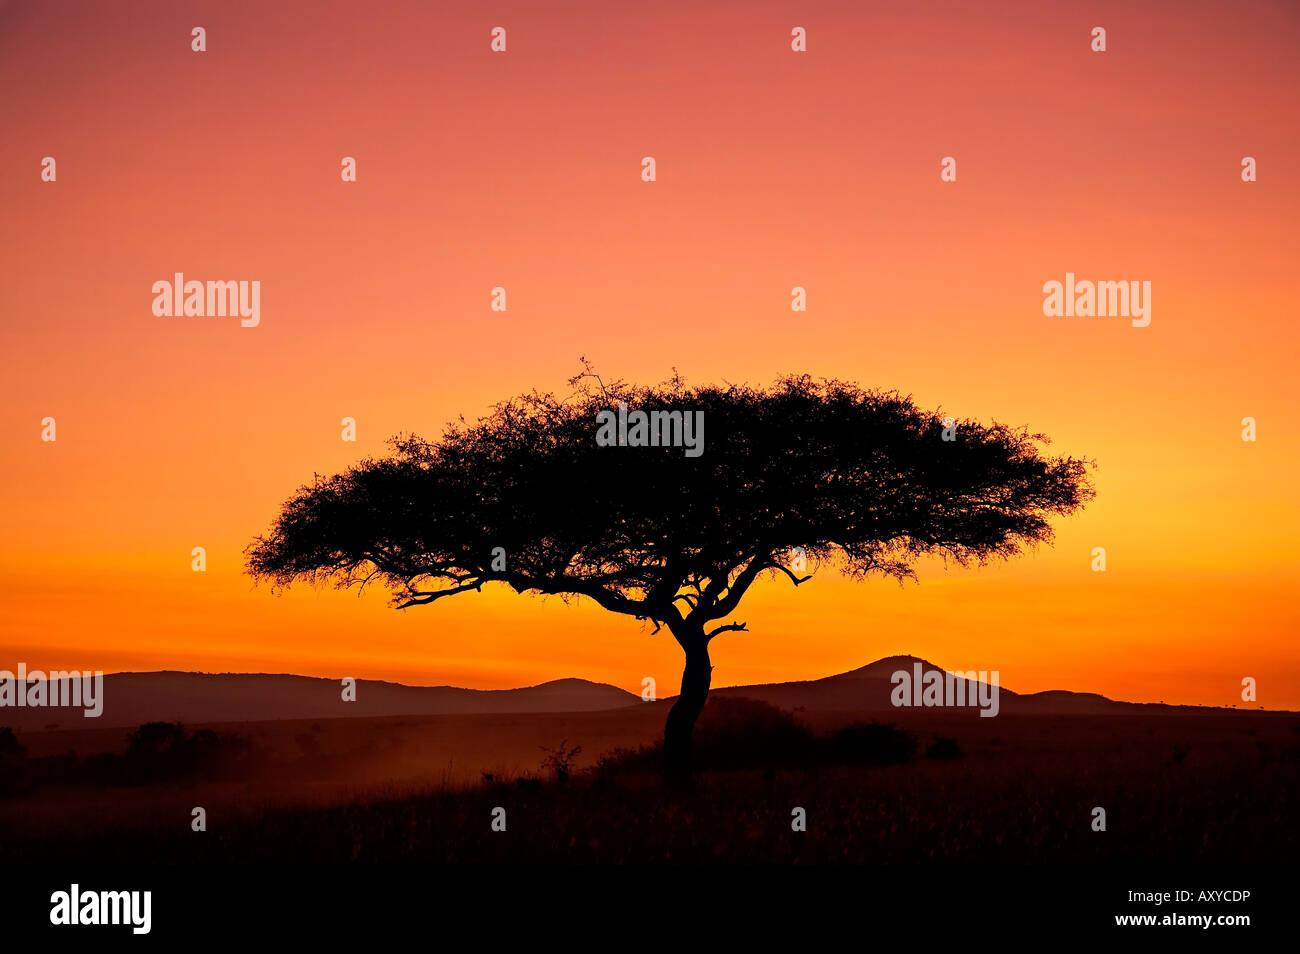 Acacia tree silhouetted at dawn, Masai Mara Game Reserve, Kenya, East Africa, Africa - Stock Image